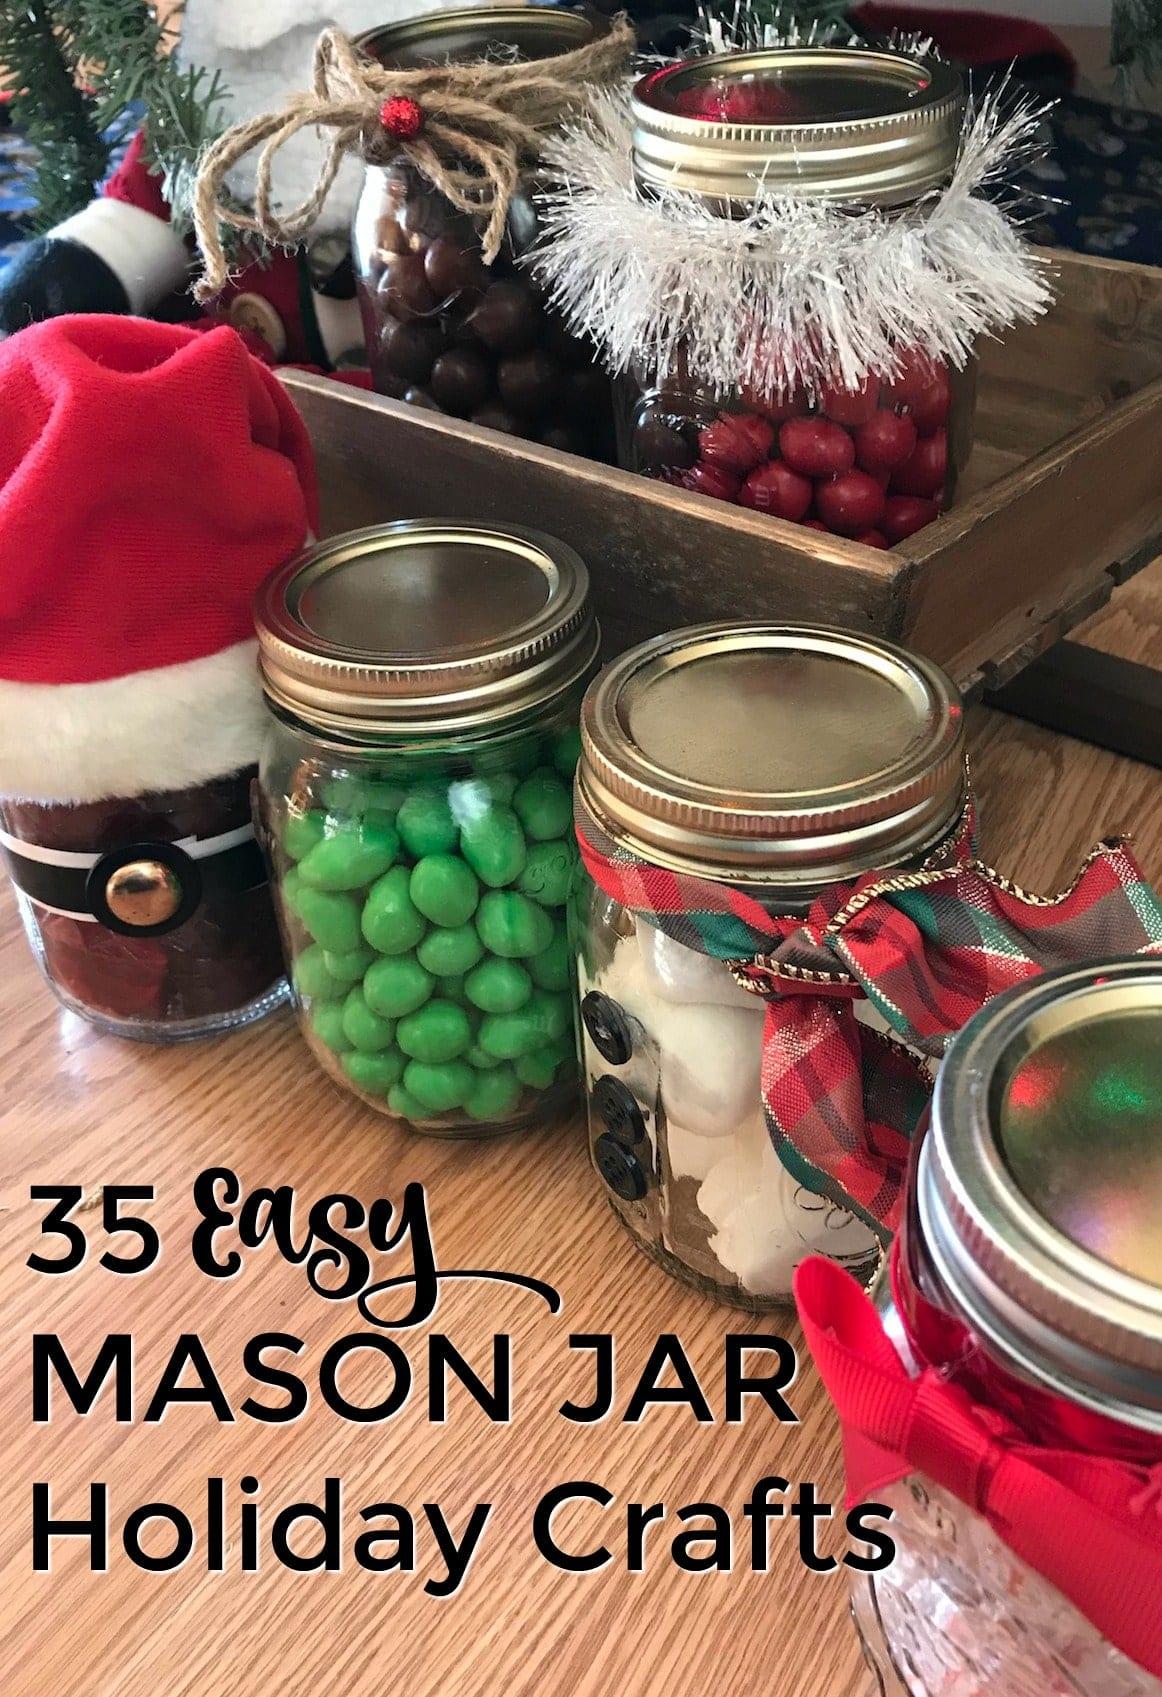 35 easy mason jar holiday crafts